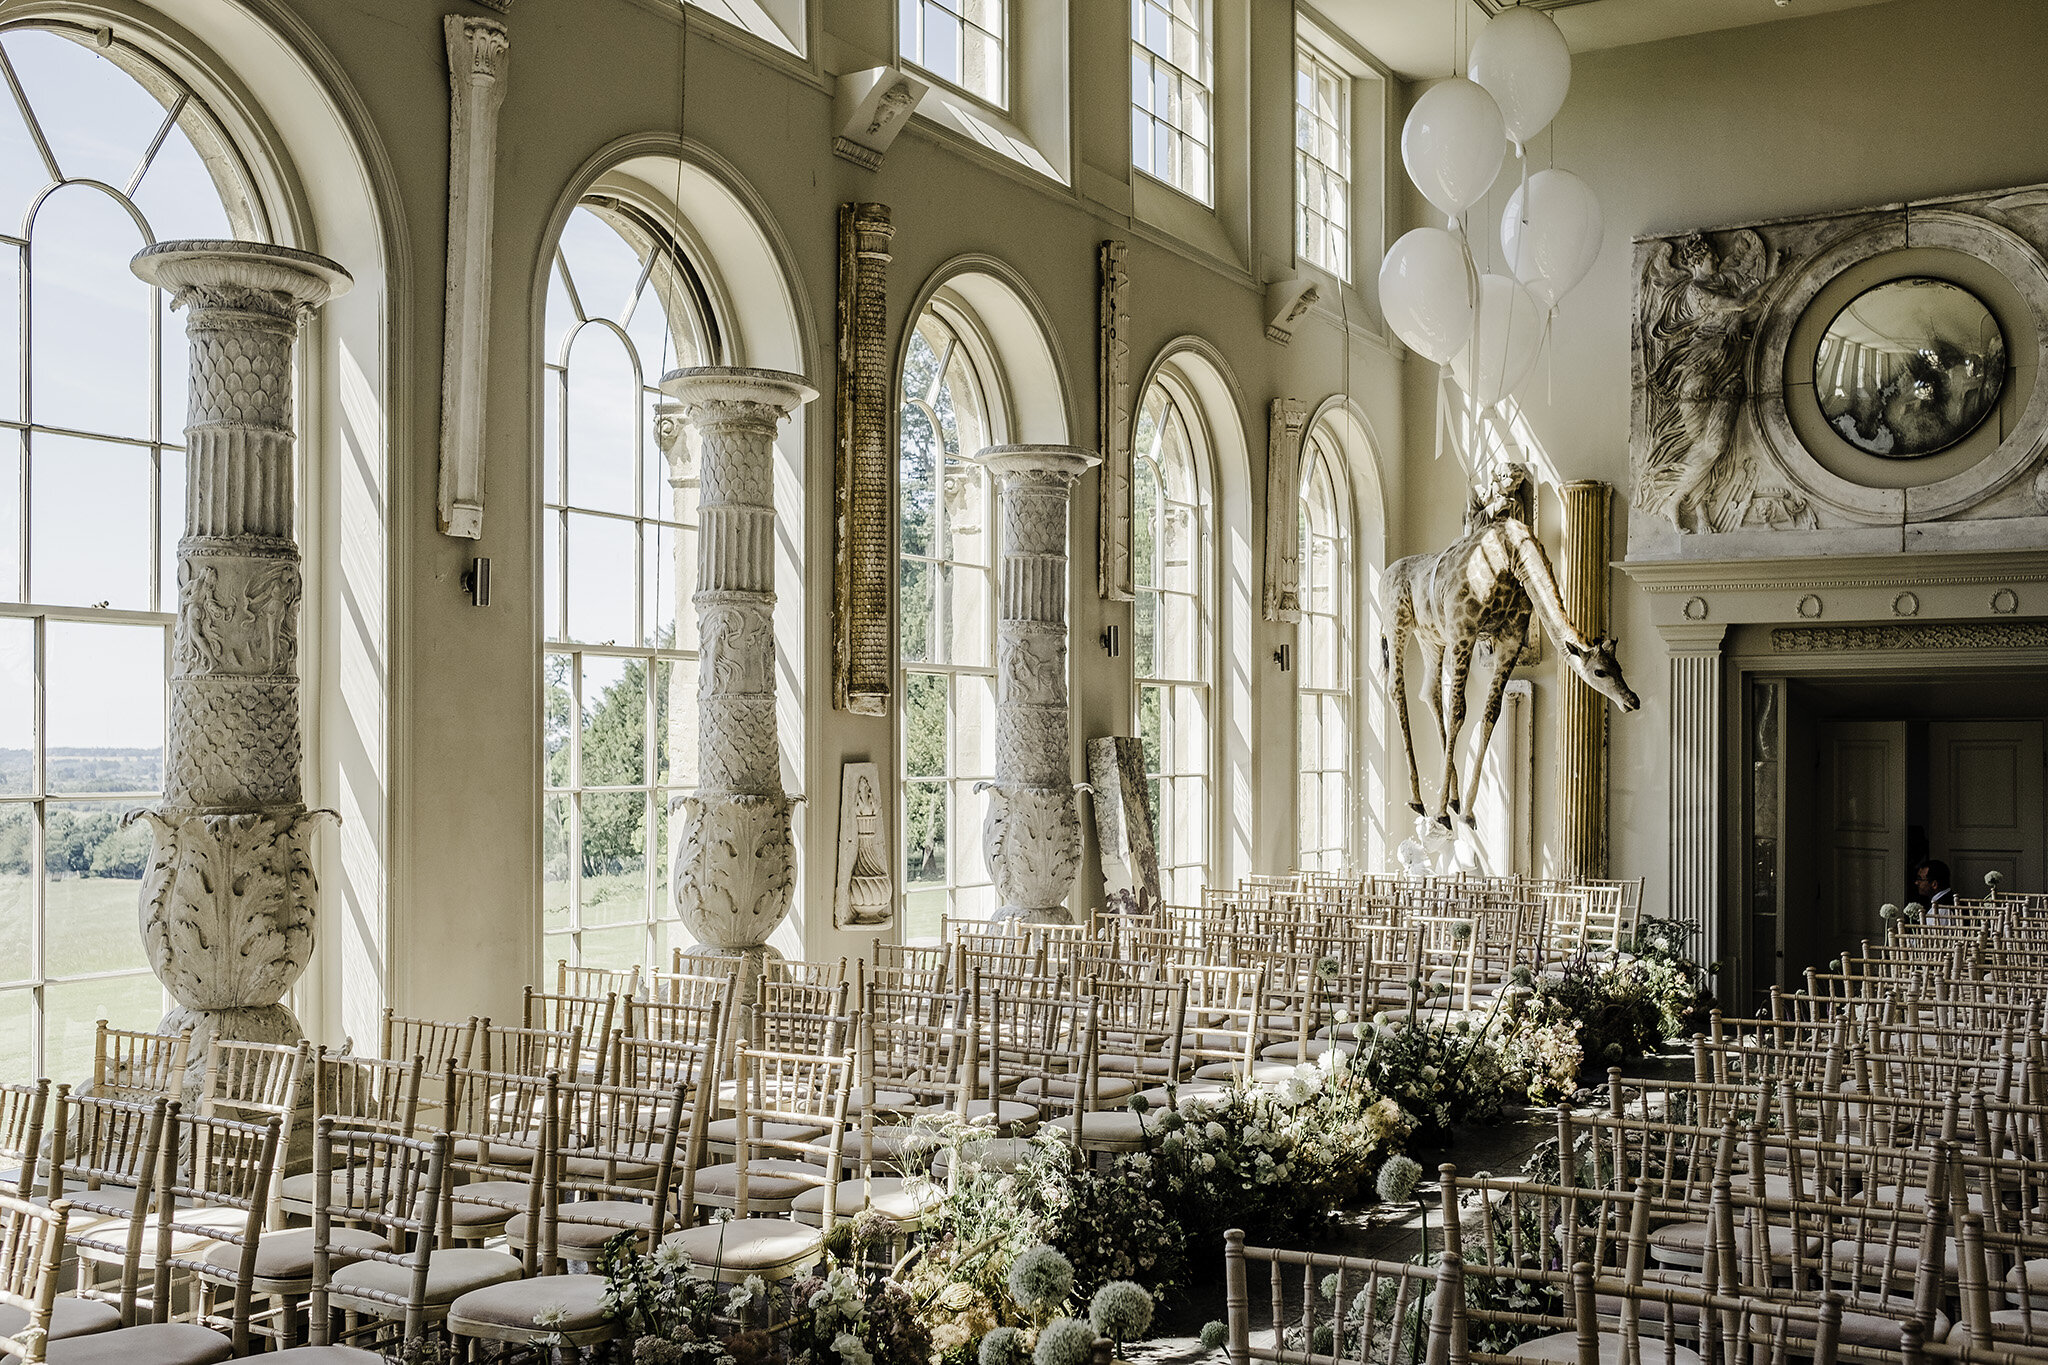 Scott-Stockwell-Photography-wedding-photographer-aynhoe-park-interior.jpg